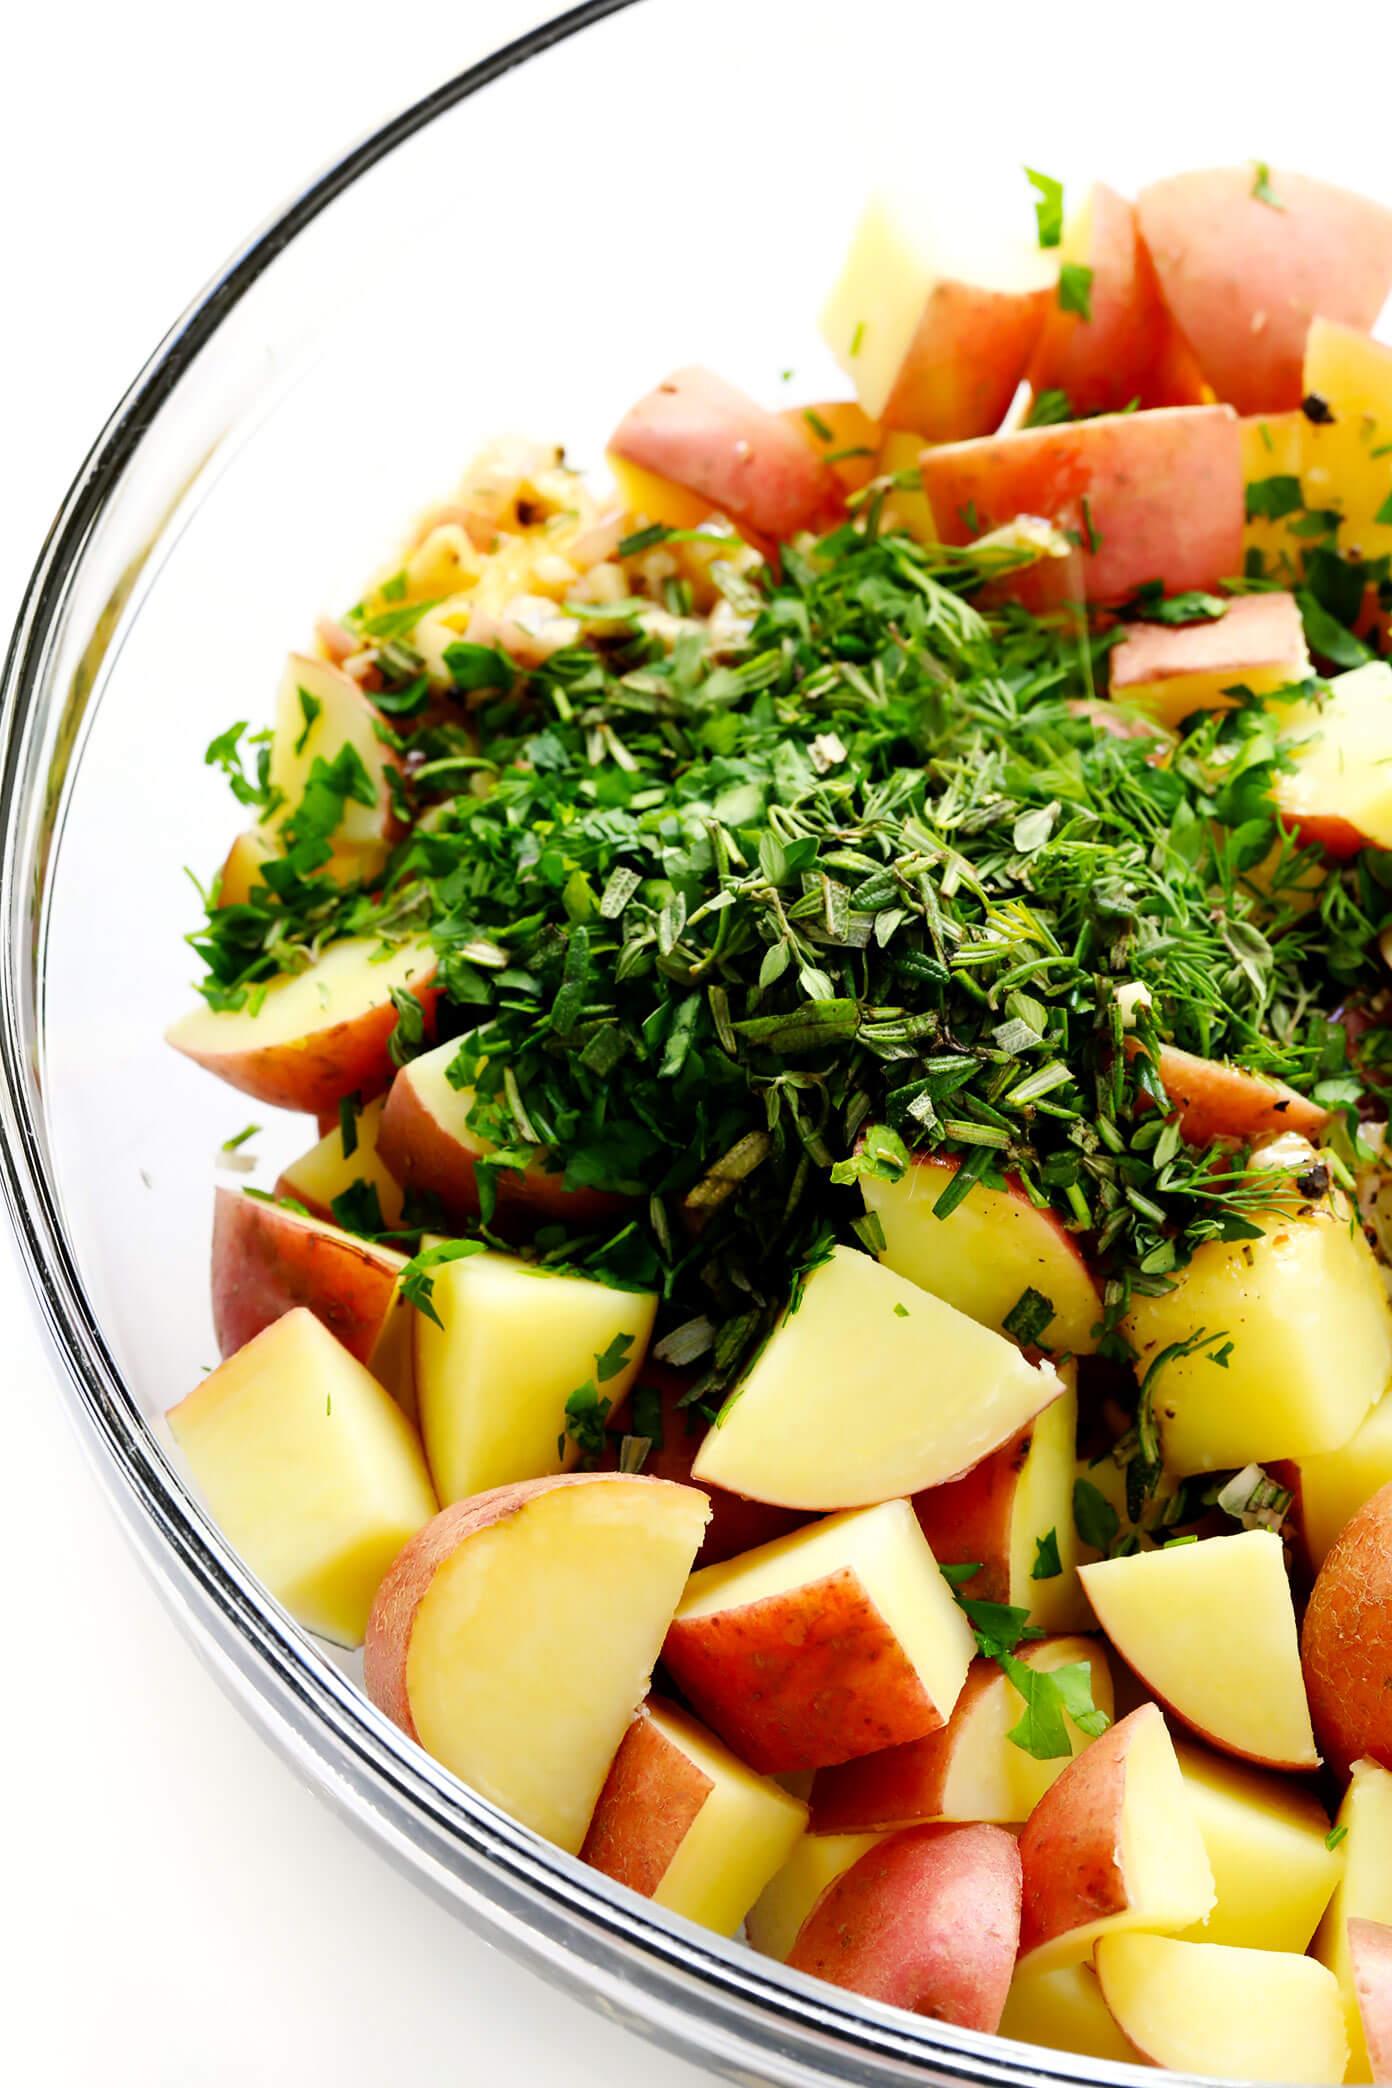 French Potato Salad Ingredients (Potatoes, Lemon Vinaigrette, Shallots and Fresh Herbs)